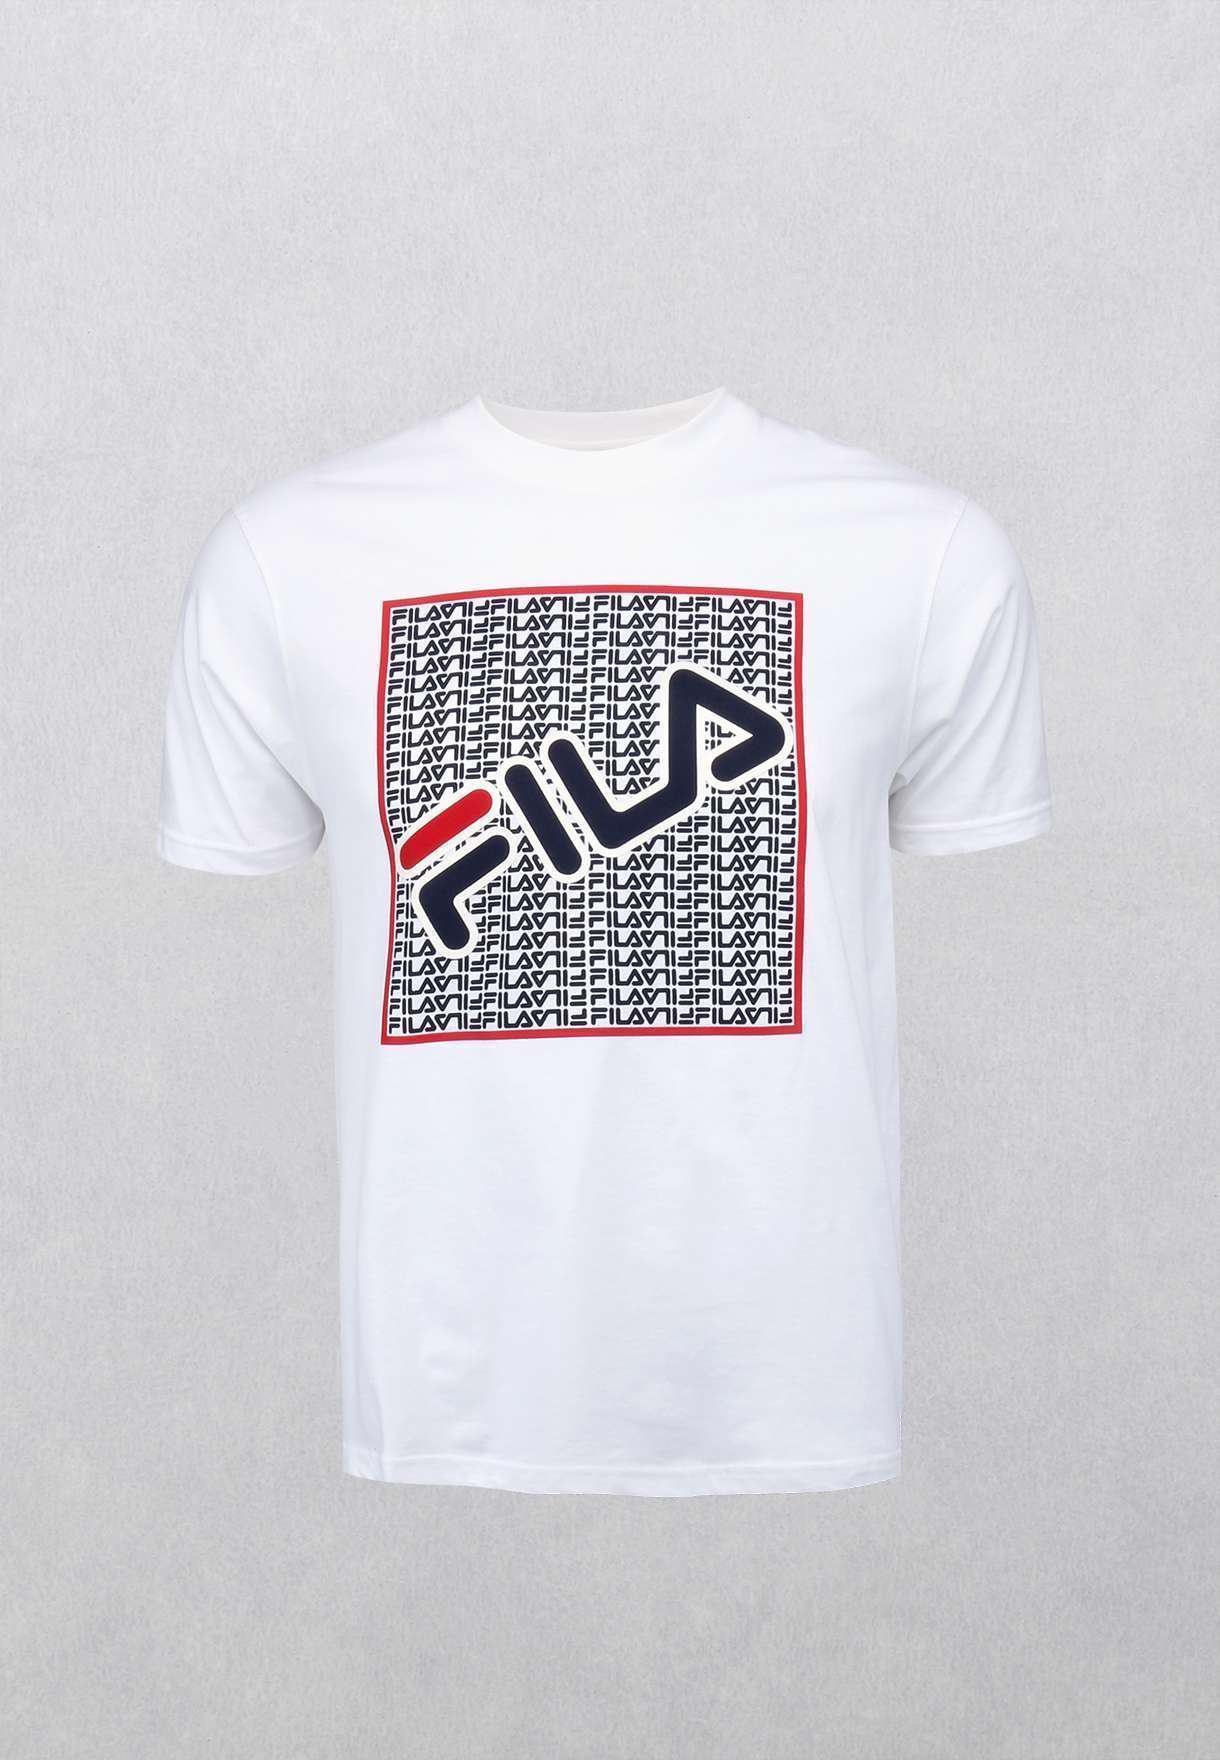 Sidney T-Shirts